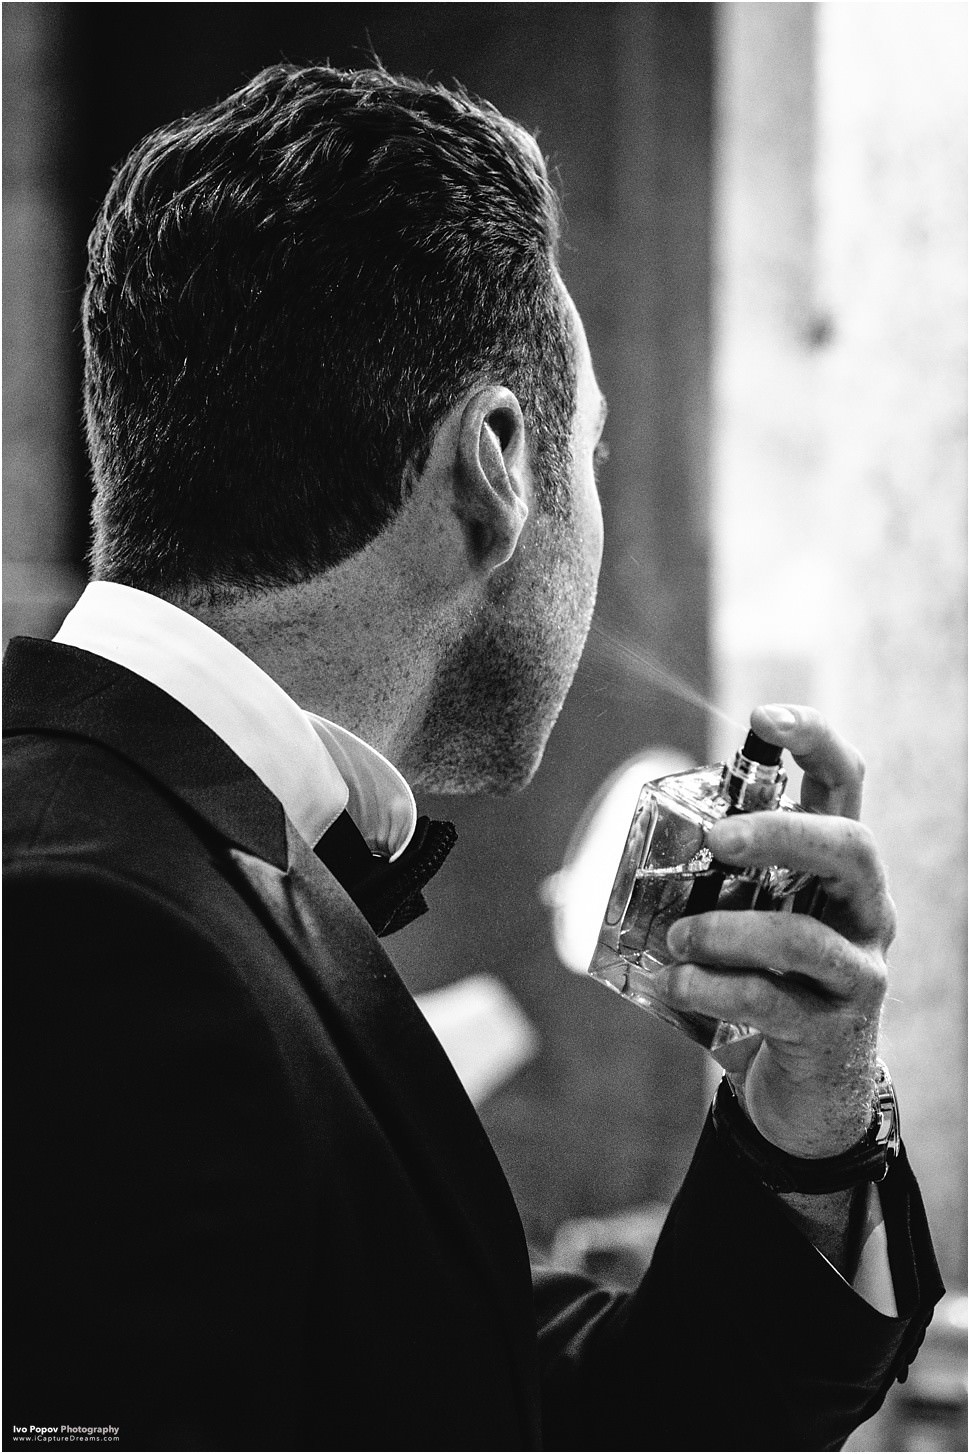 Huwelijksfotograaf Ivo Popov_3786